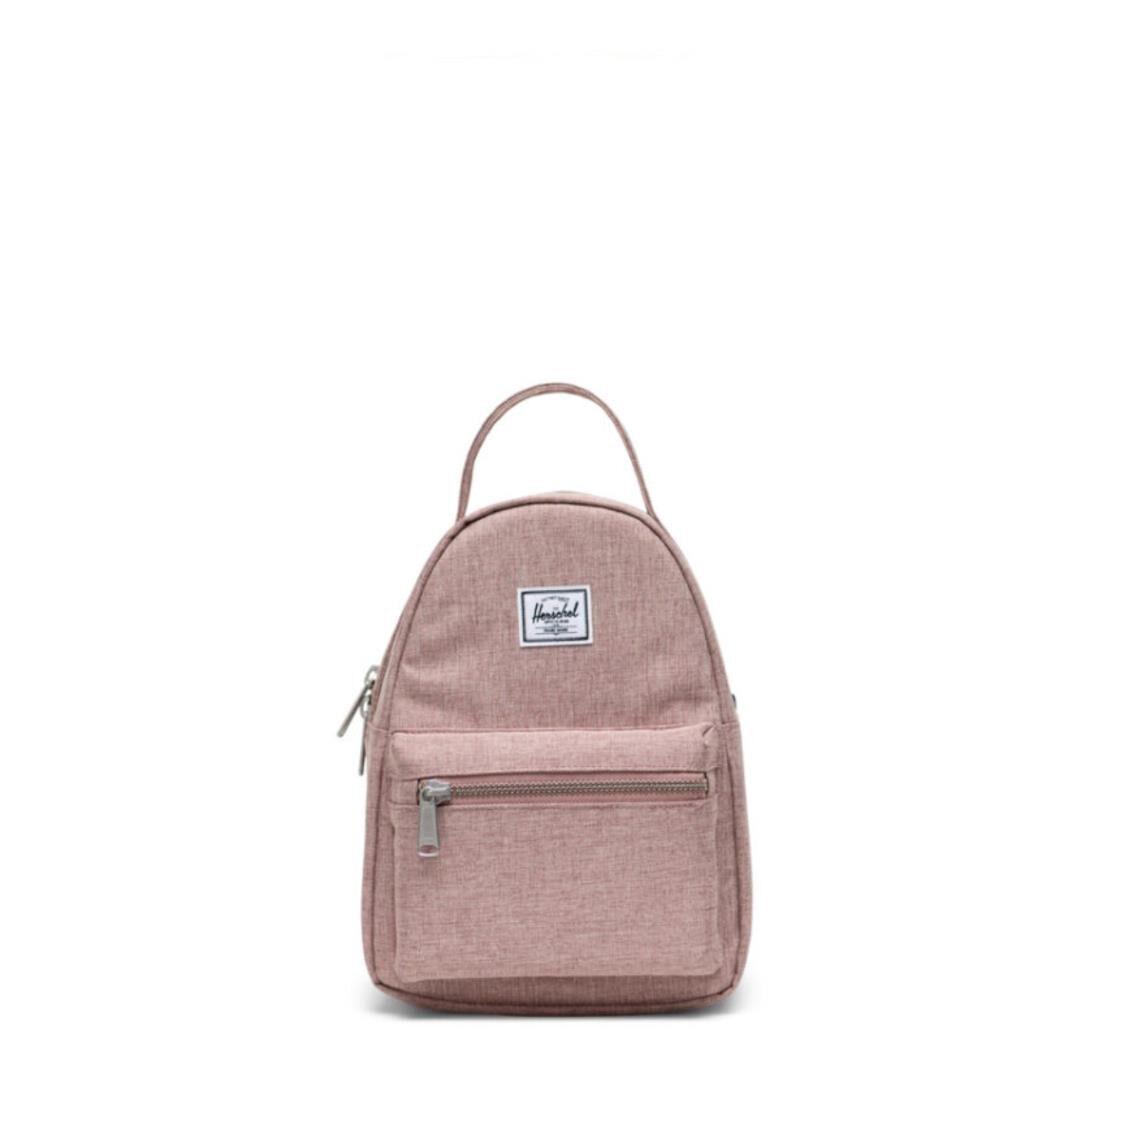 Herschel Nova Mini Ash Rose Crosshatch Backpack 10501-04885-OS